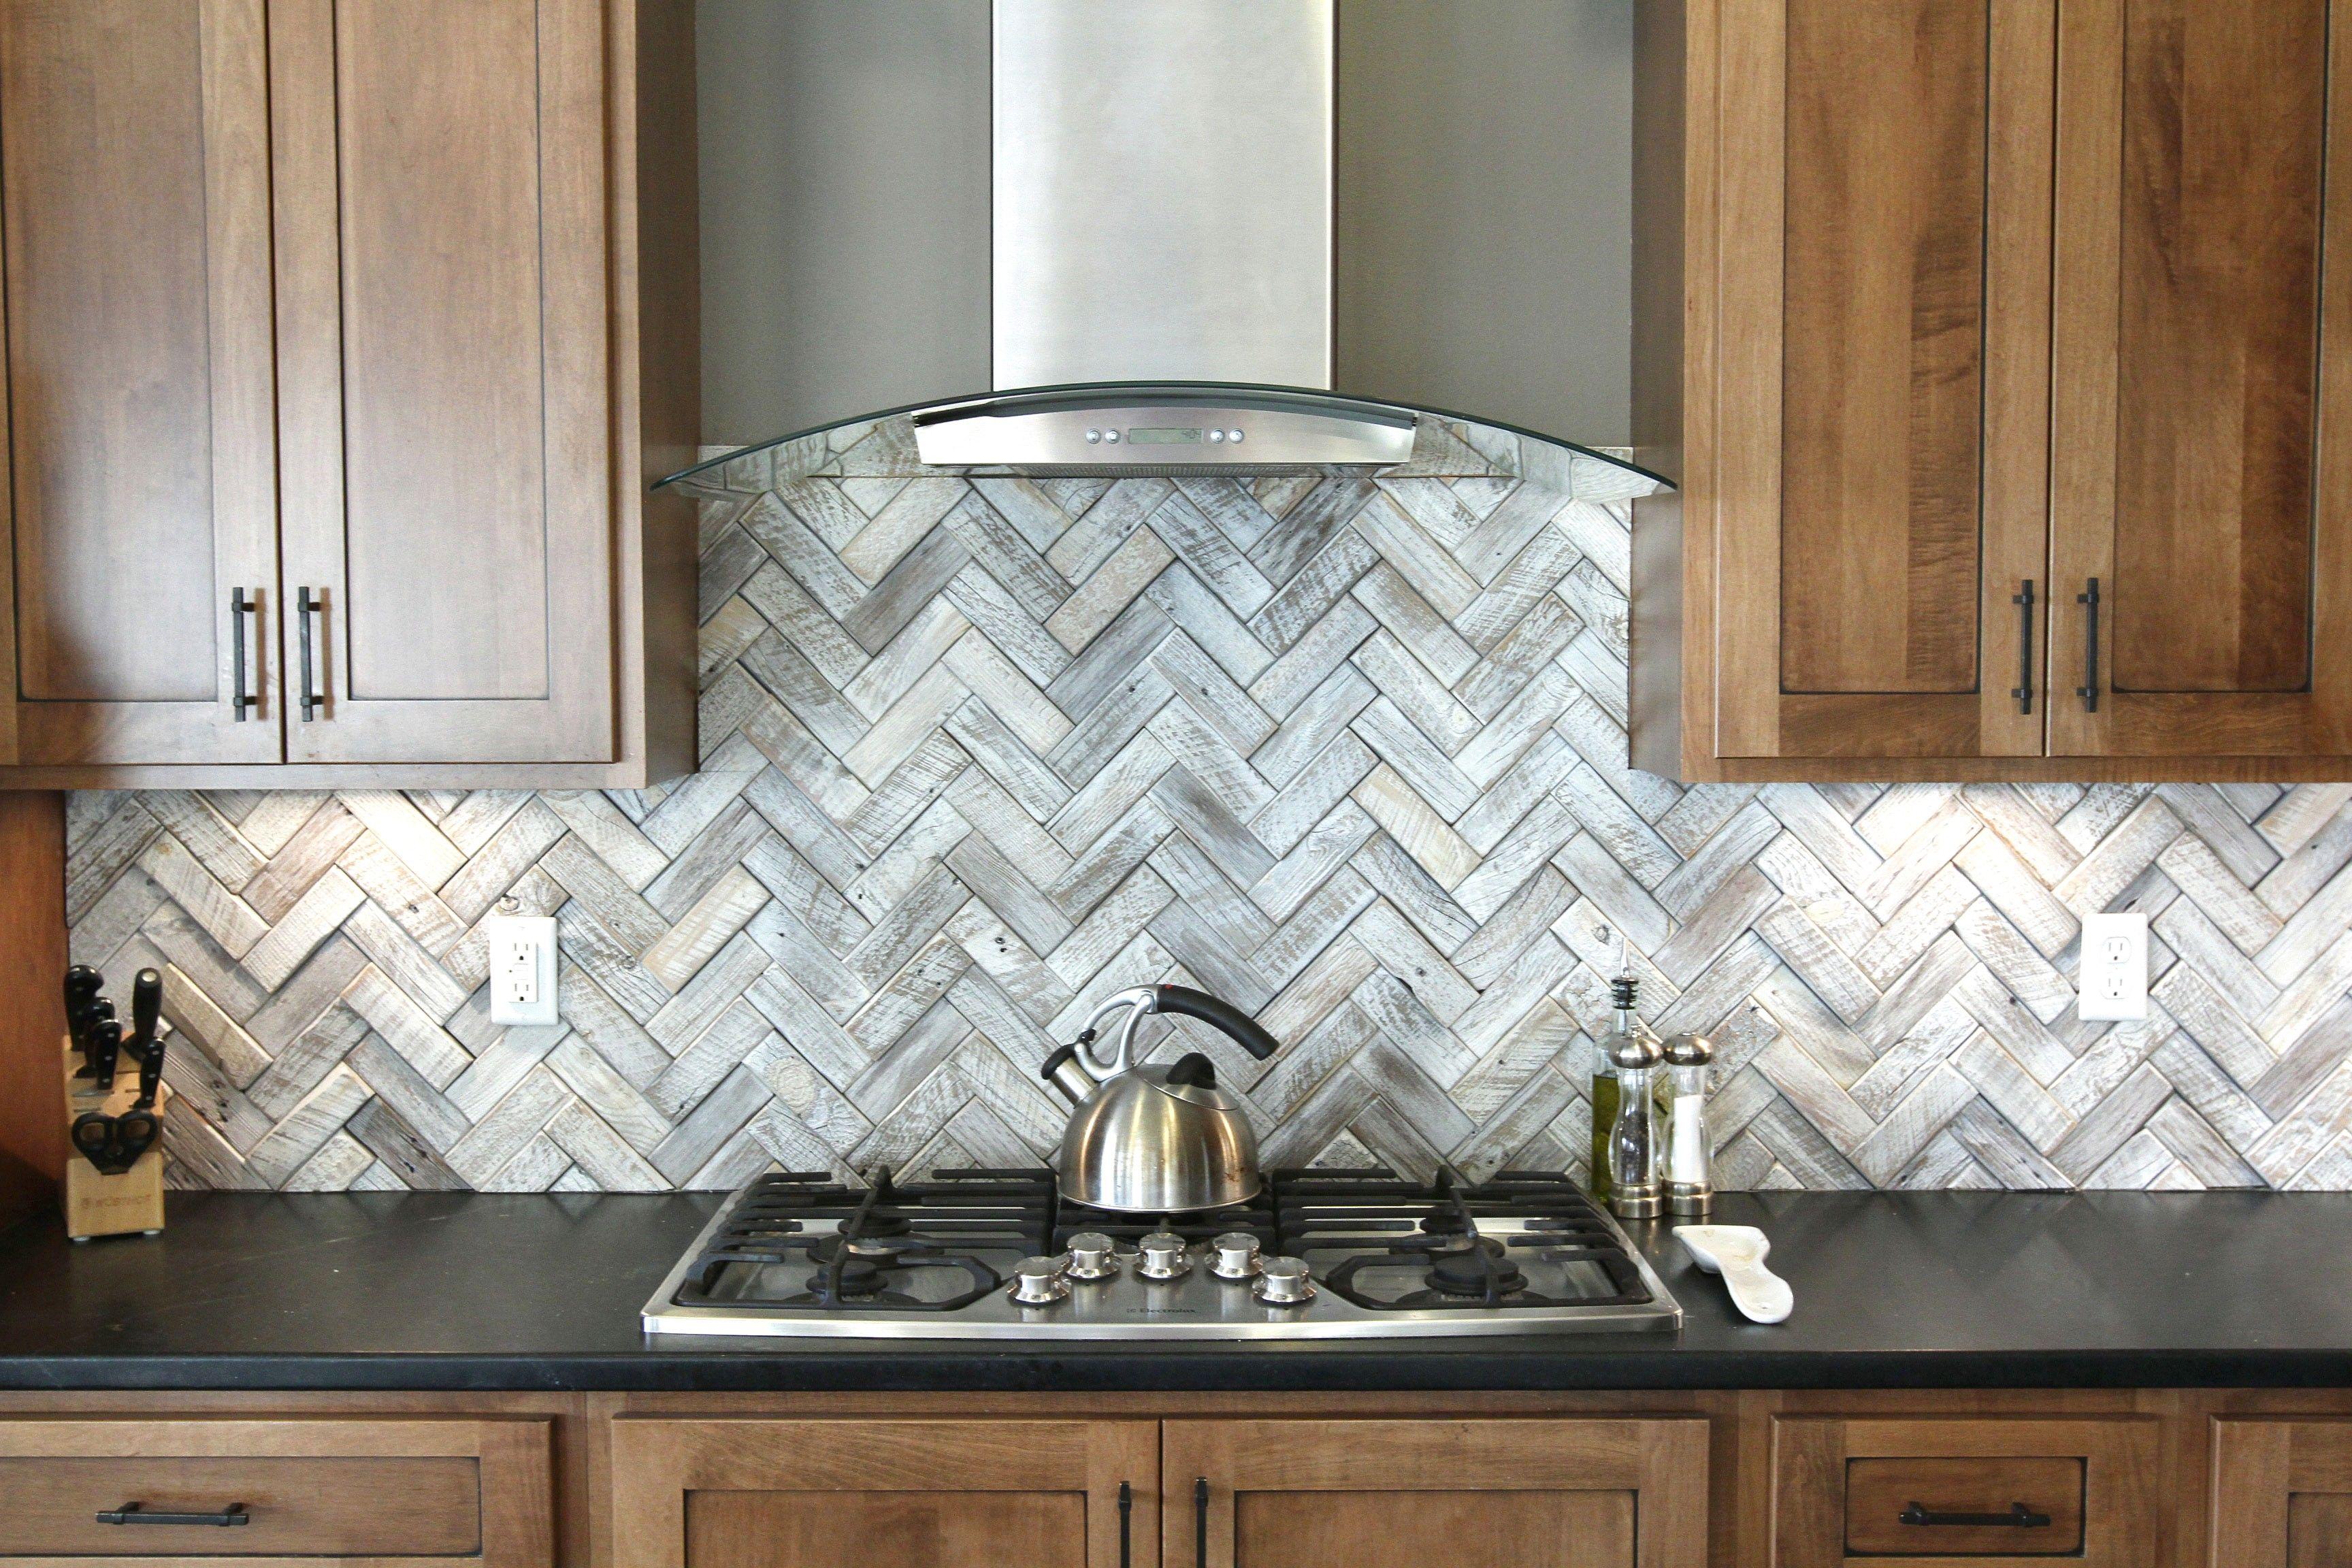 Beautiful Tile Backsplash Patterns For Kitchen Decor Faux Stainless Steel Herringbone Backsplash Black Granite Kitchen Countertops Herringbone Tile Backsplash